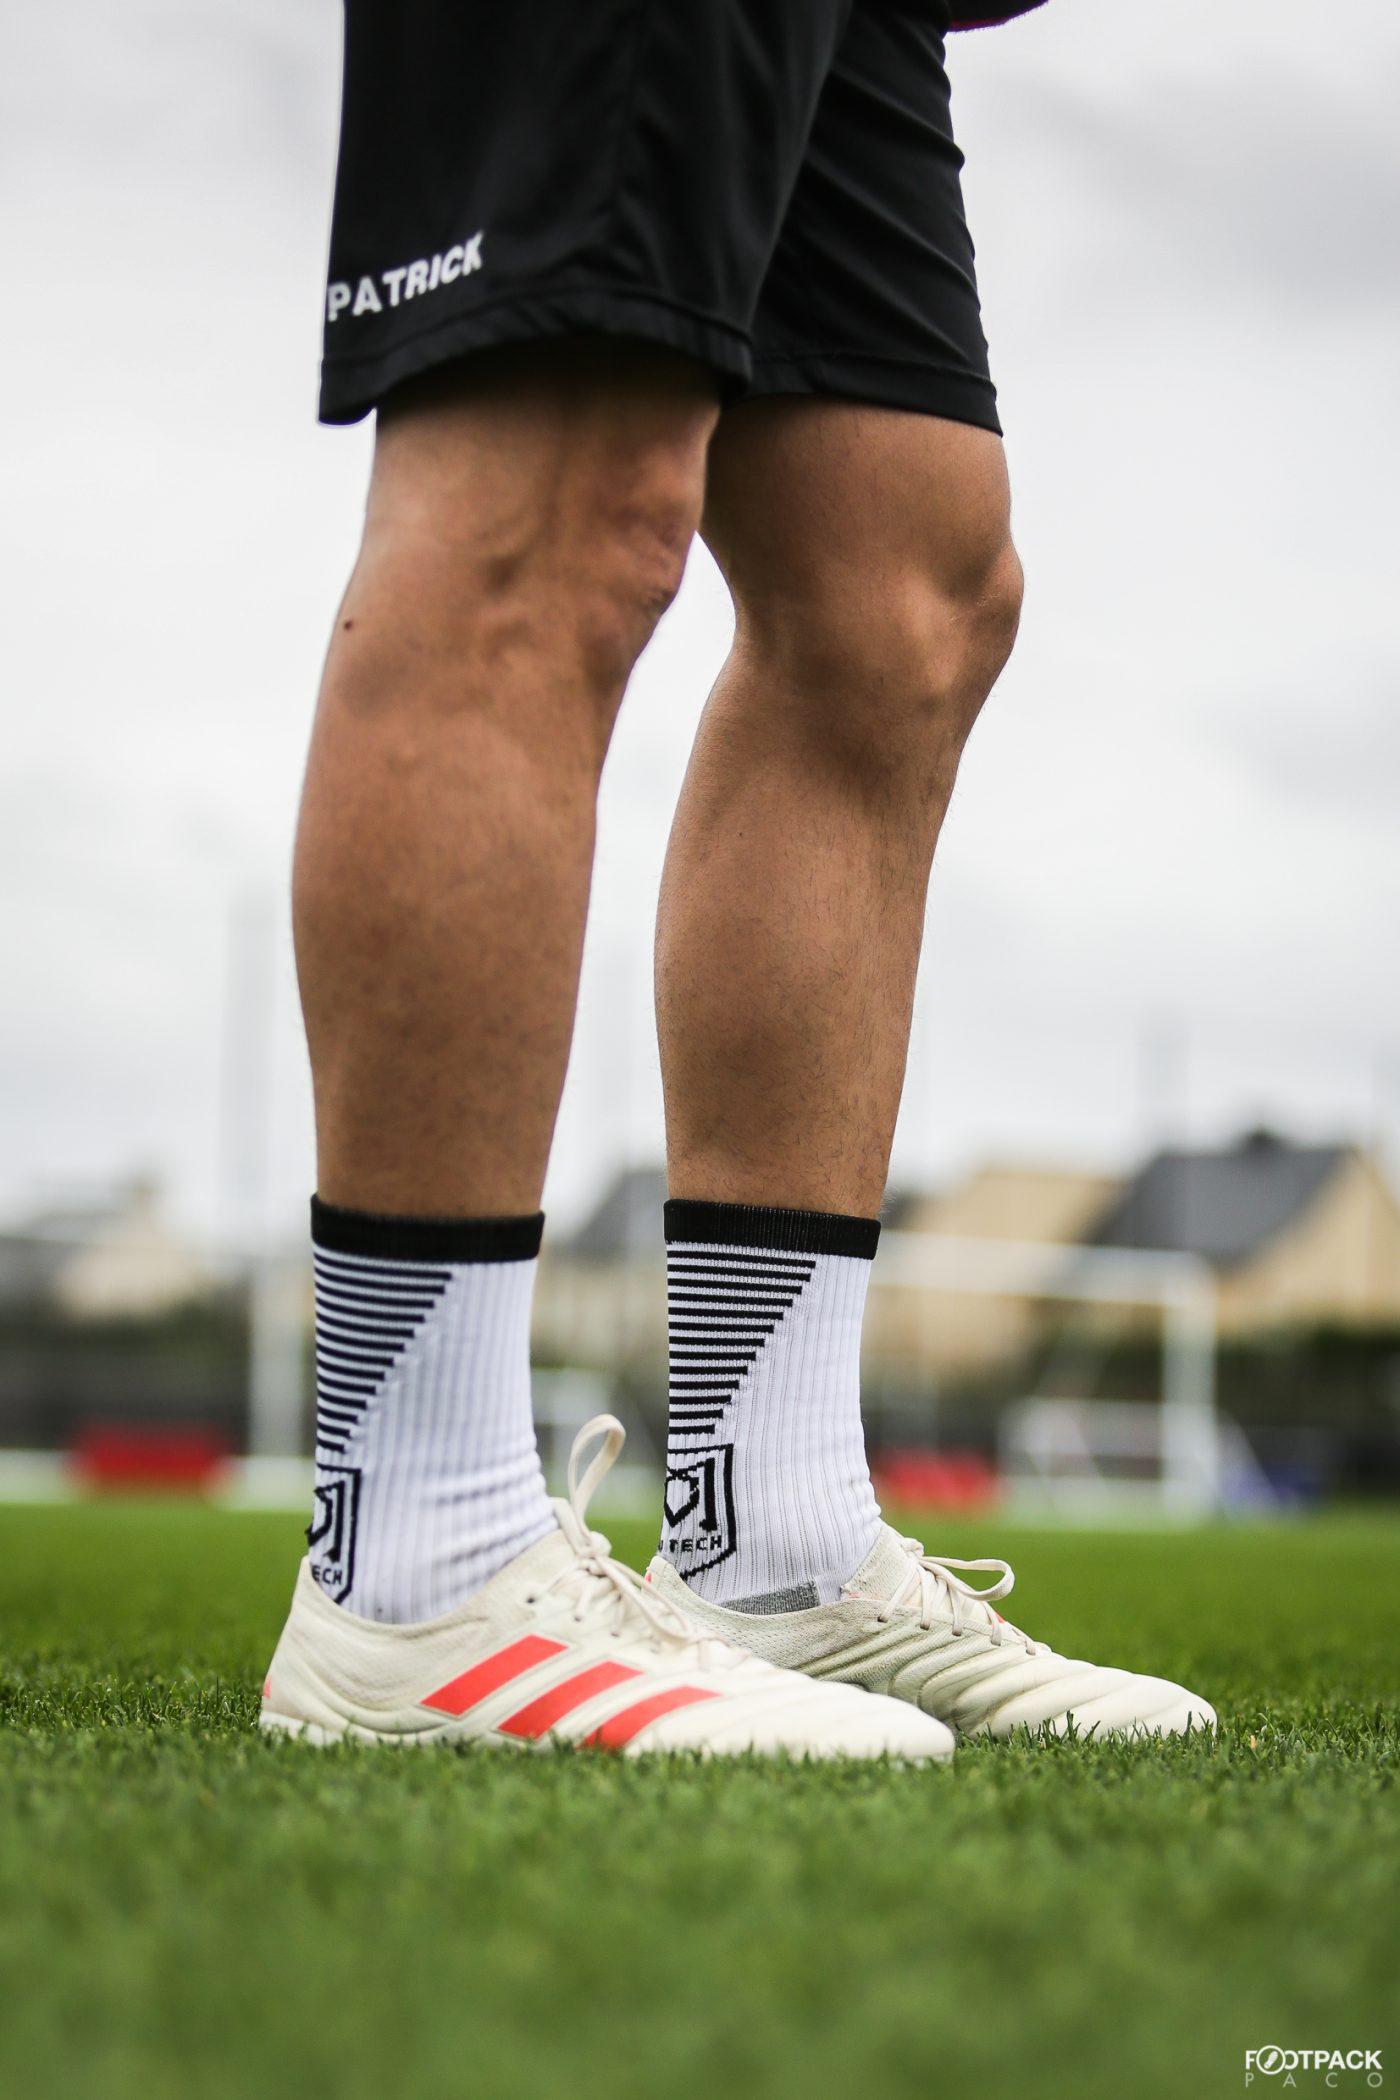 test-chaussettes-mc-protech-football-footpack8